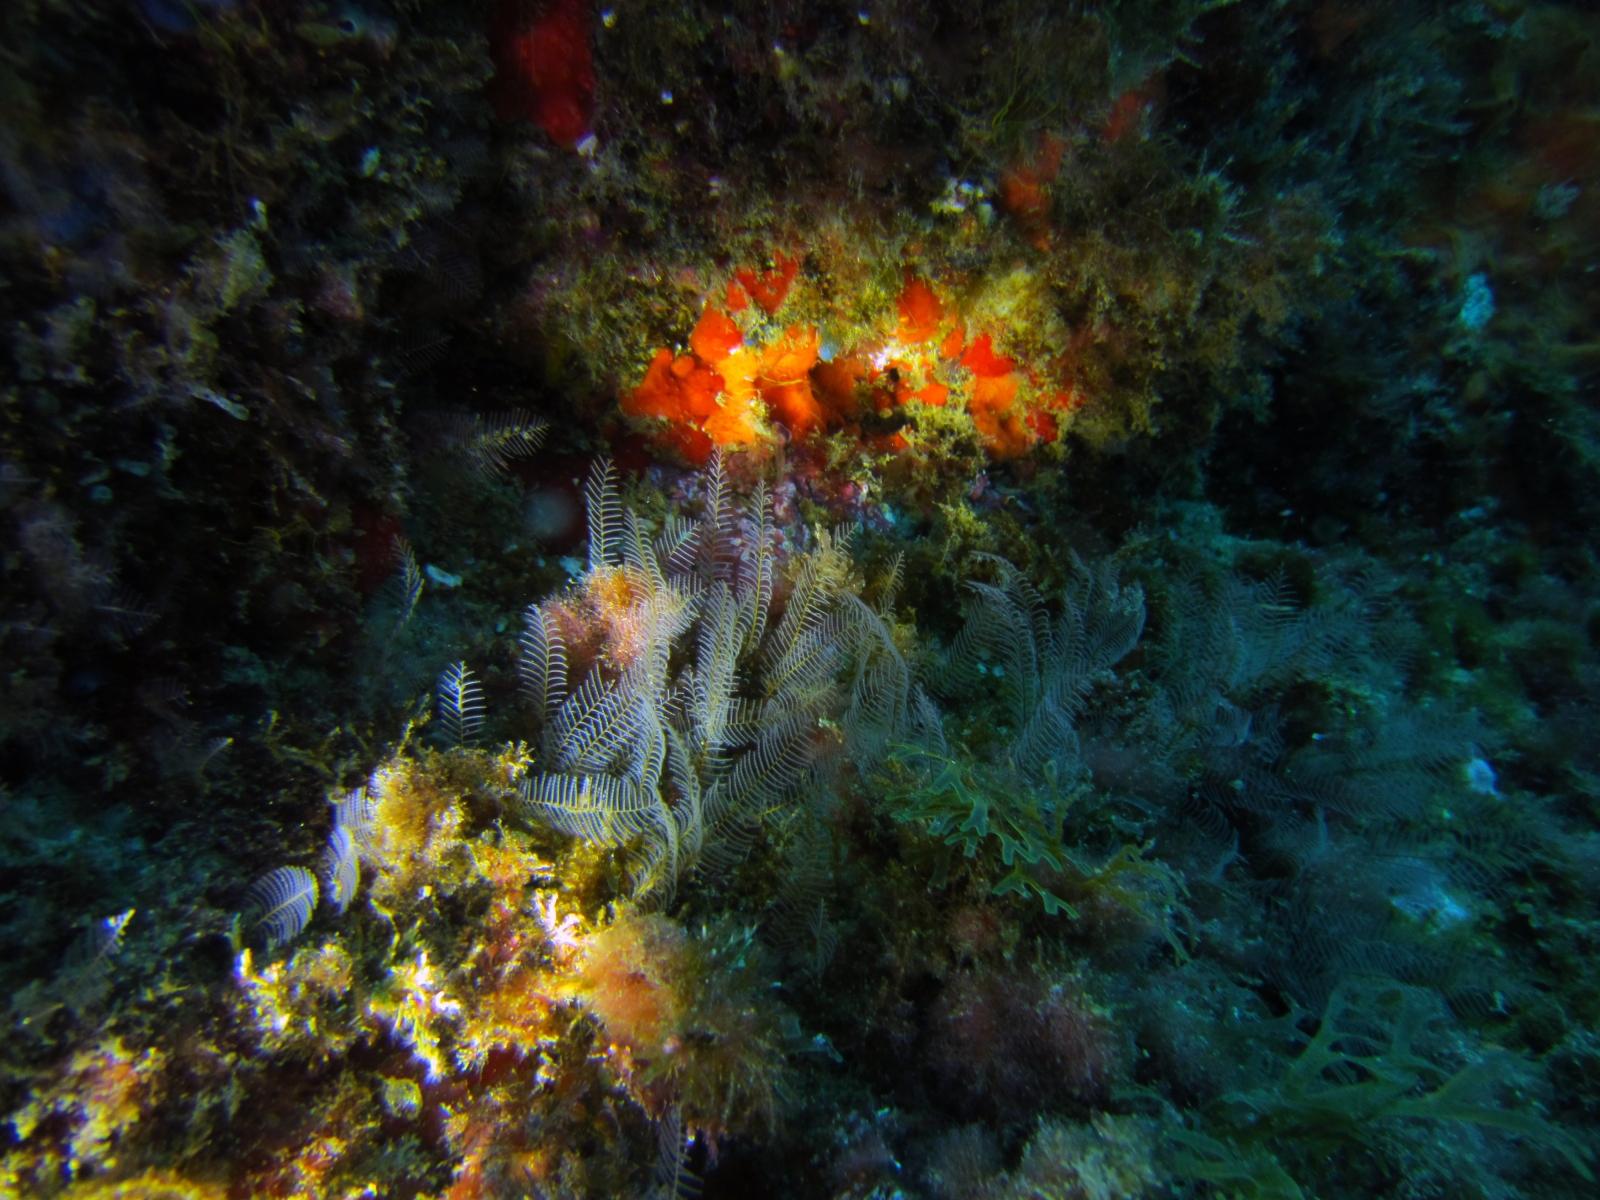 Aglaophenia_pluma_002_C_Hidrozoos_L_Tossa-de-Mar_U_Miguel_01052015